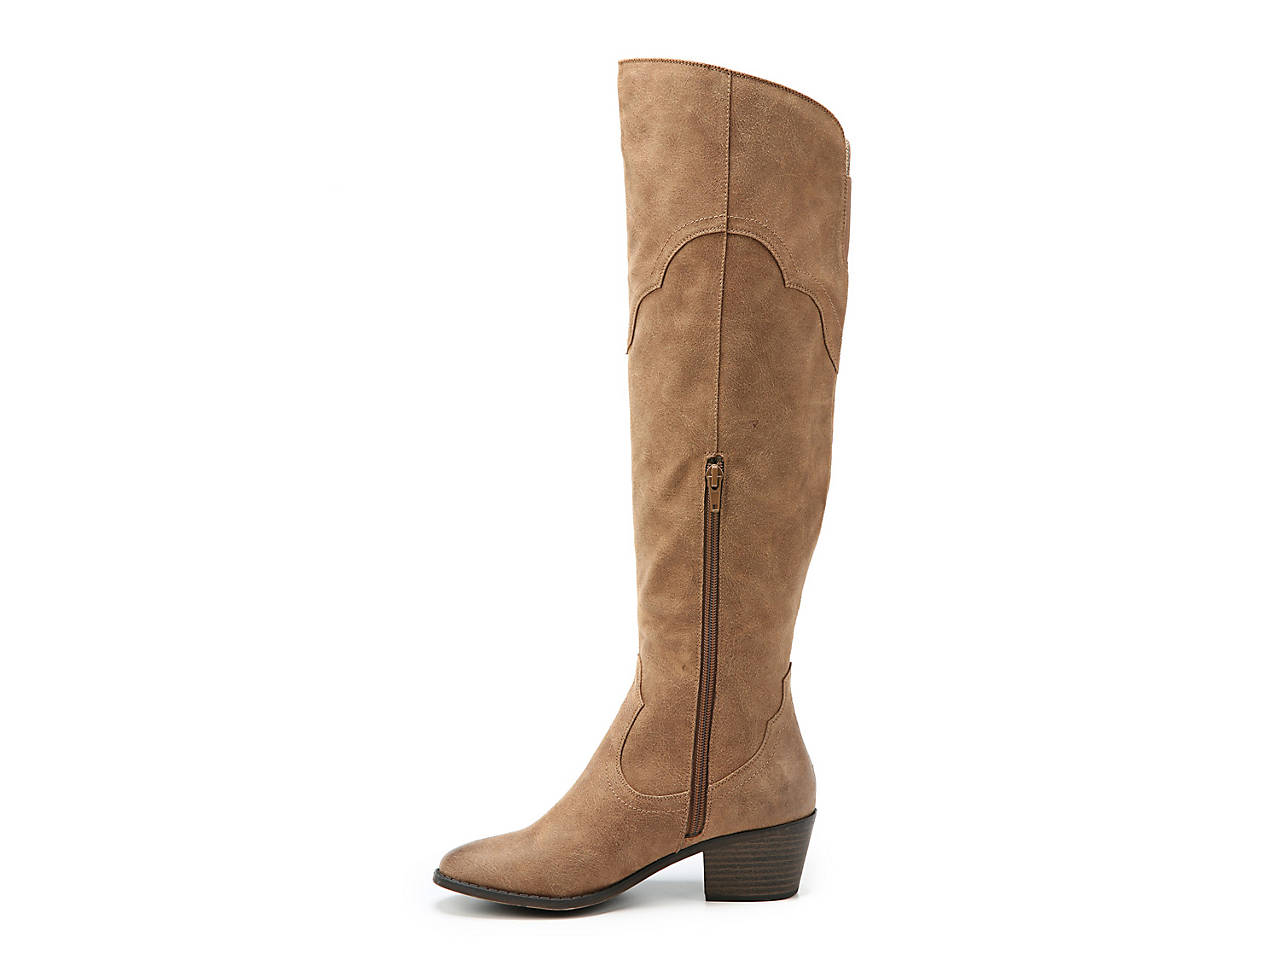 Fergalicious Bata Women's ... Over-The-Knee Boots yTJYx